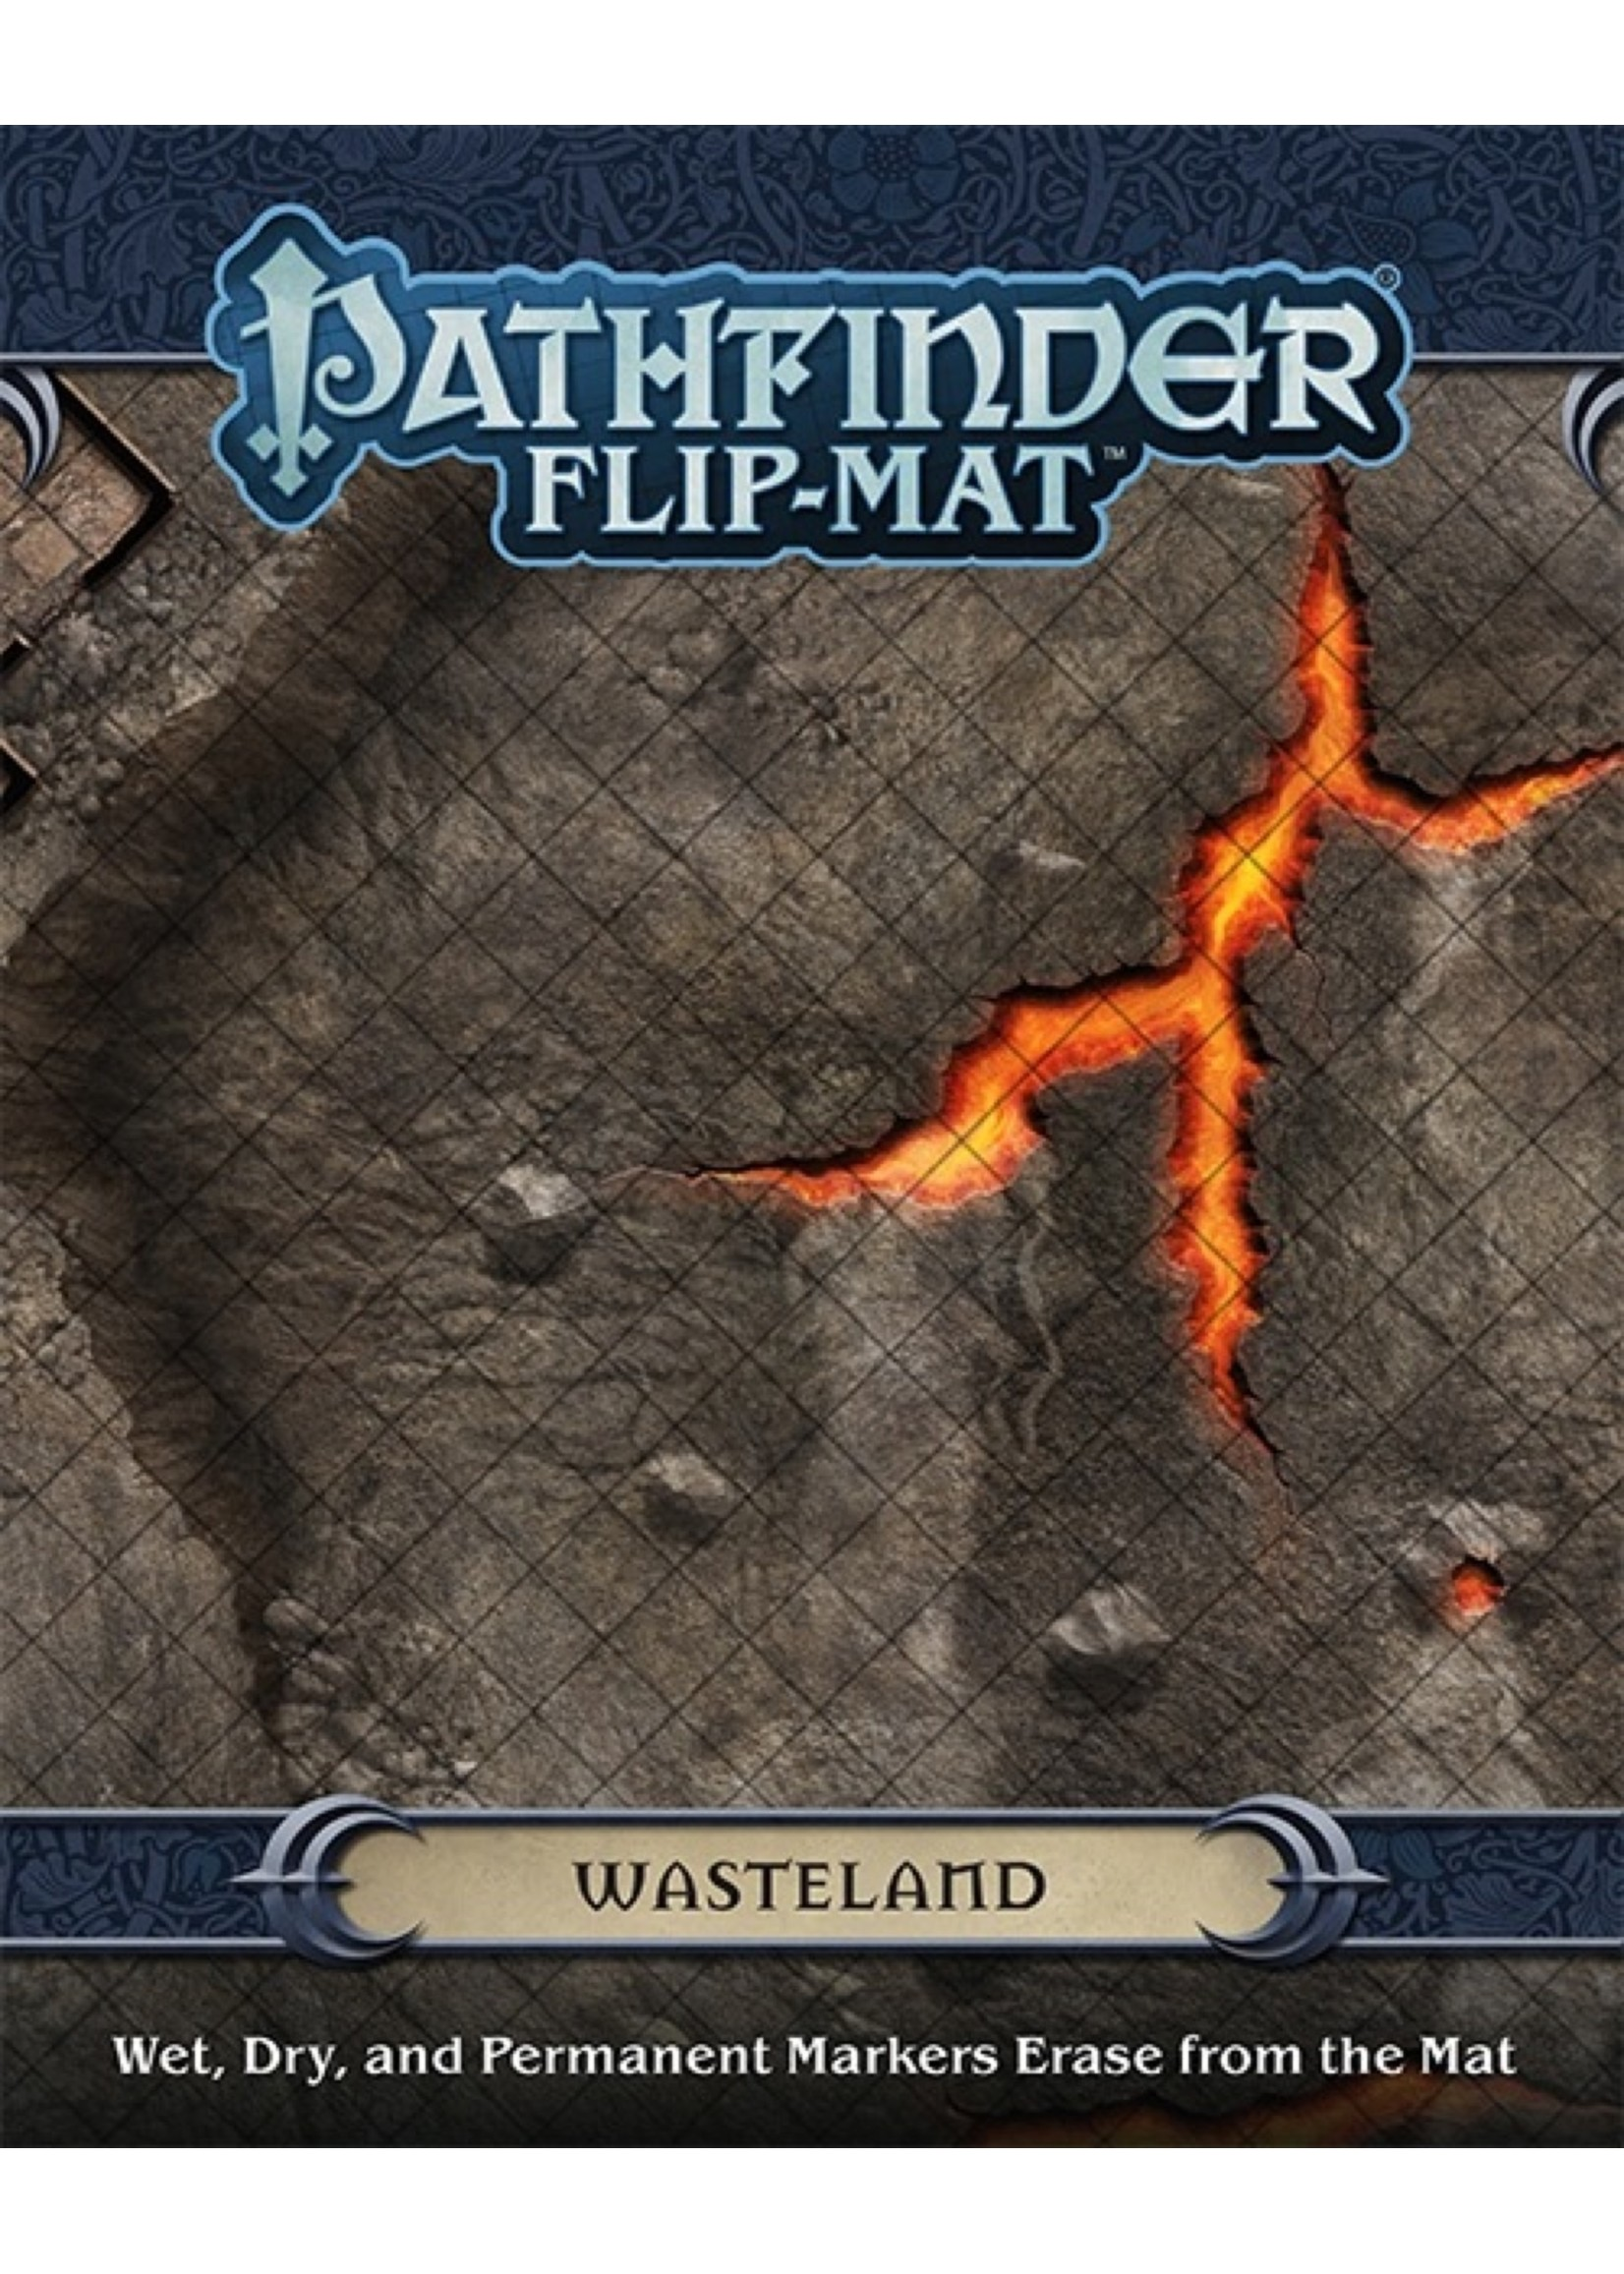 Pathfinder RPG: Flip-Mat - Wasteland